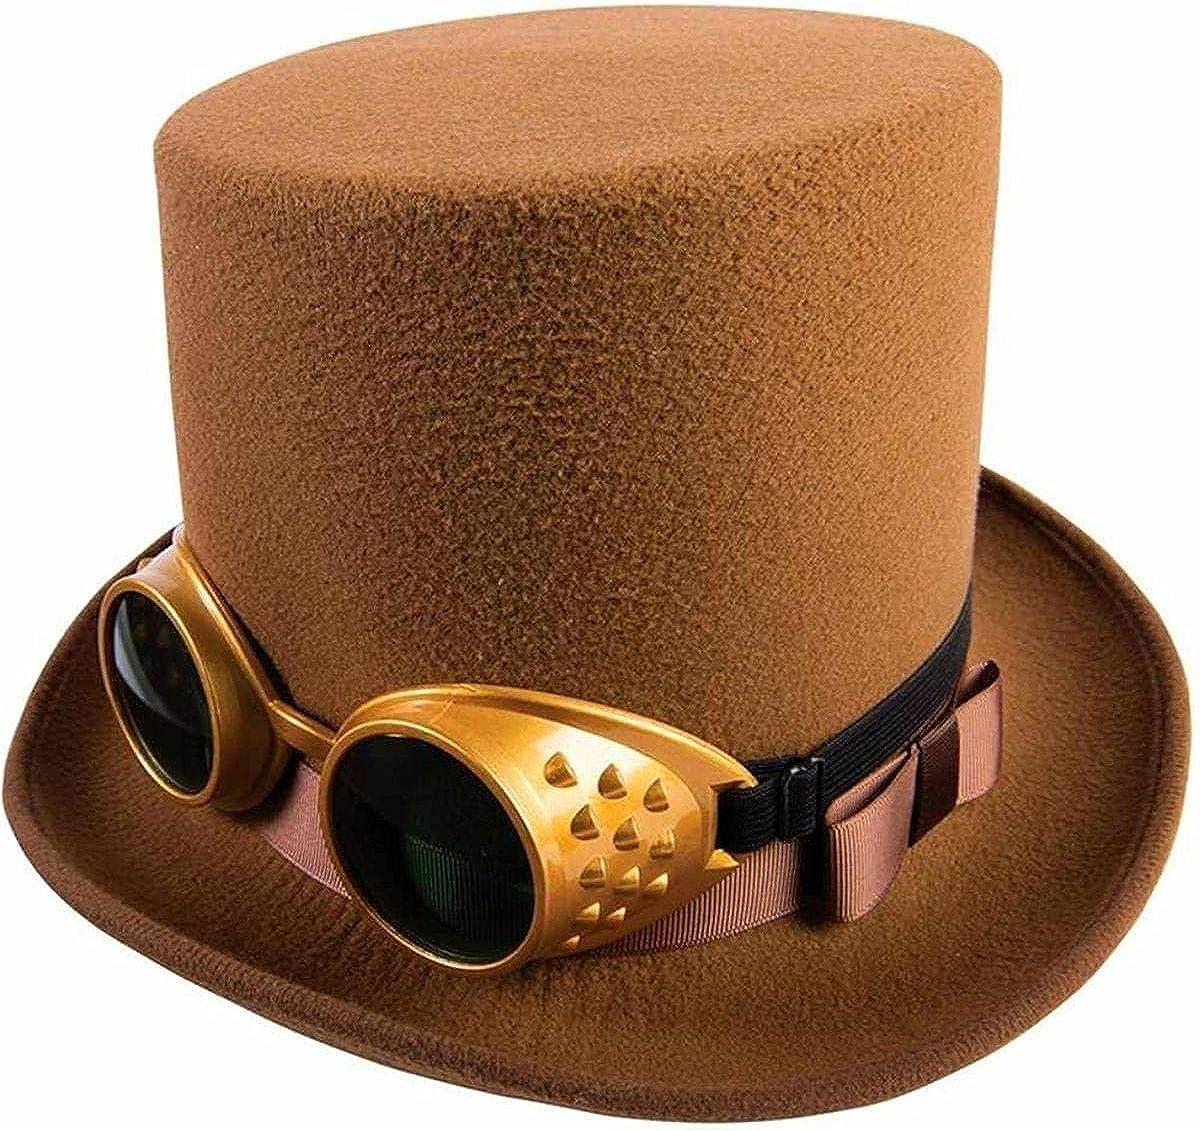 Forum Novelties Steampunk Costume Goggles